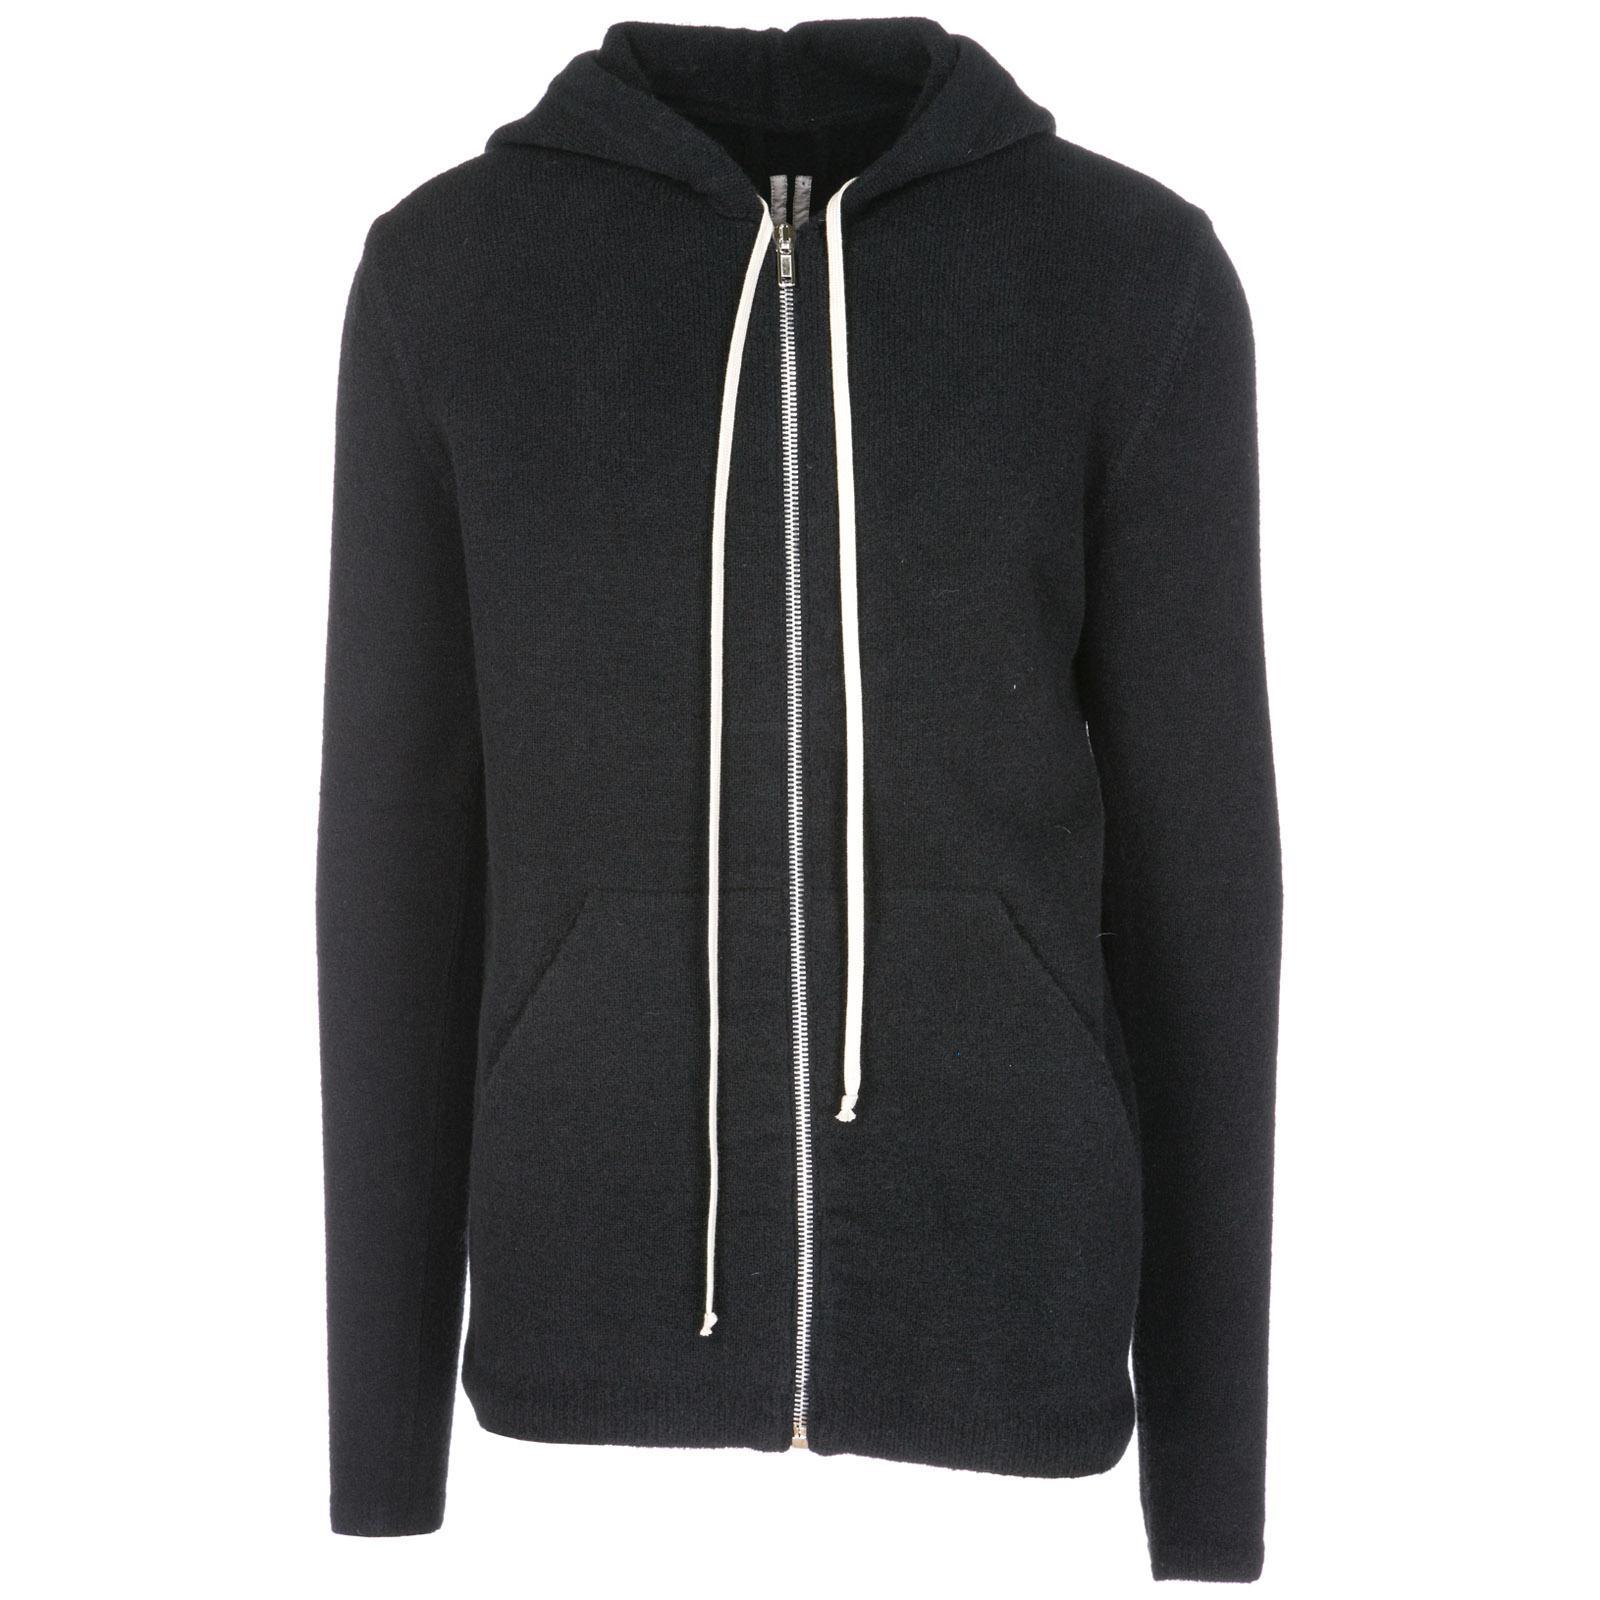 Rick Owens Men's Jumper Sweater Pullover Con Zip In Black